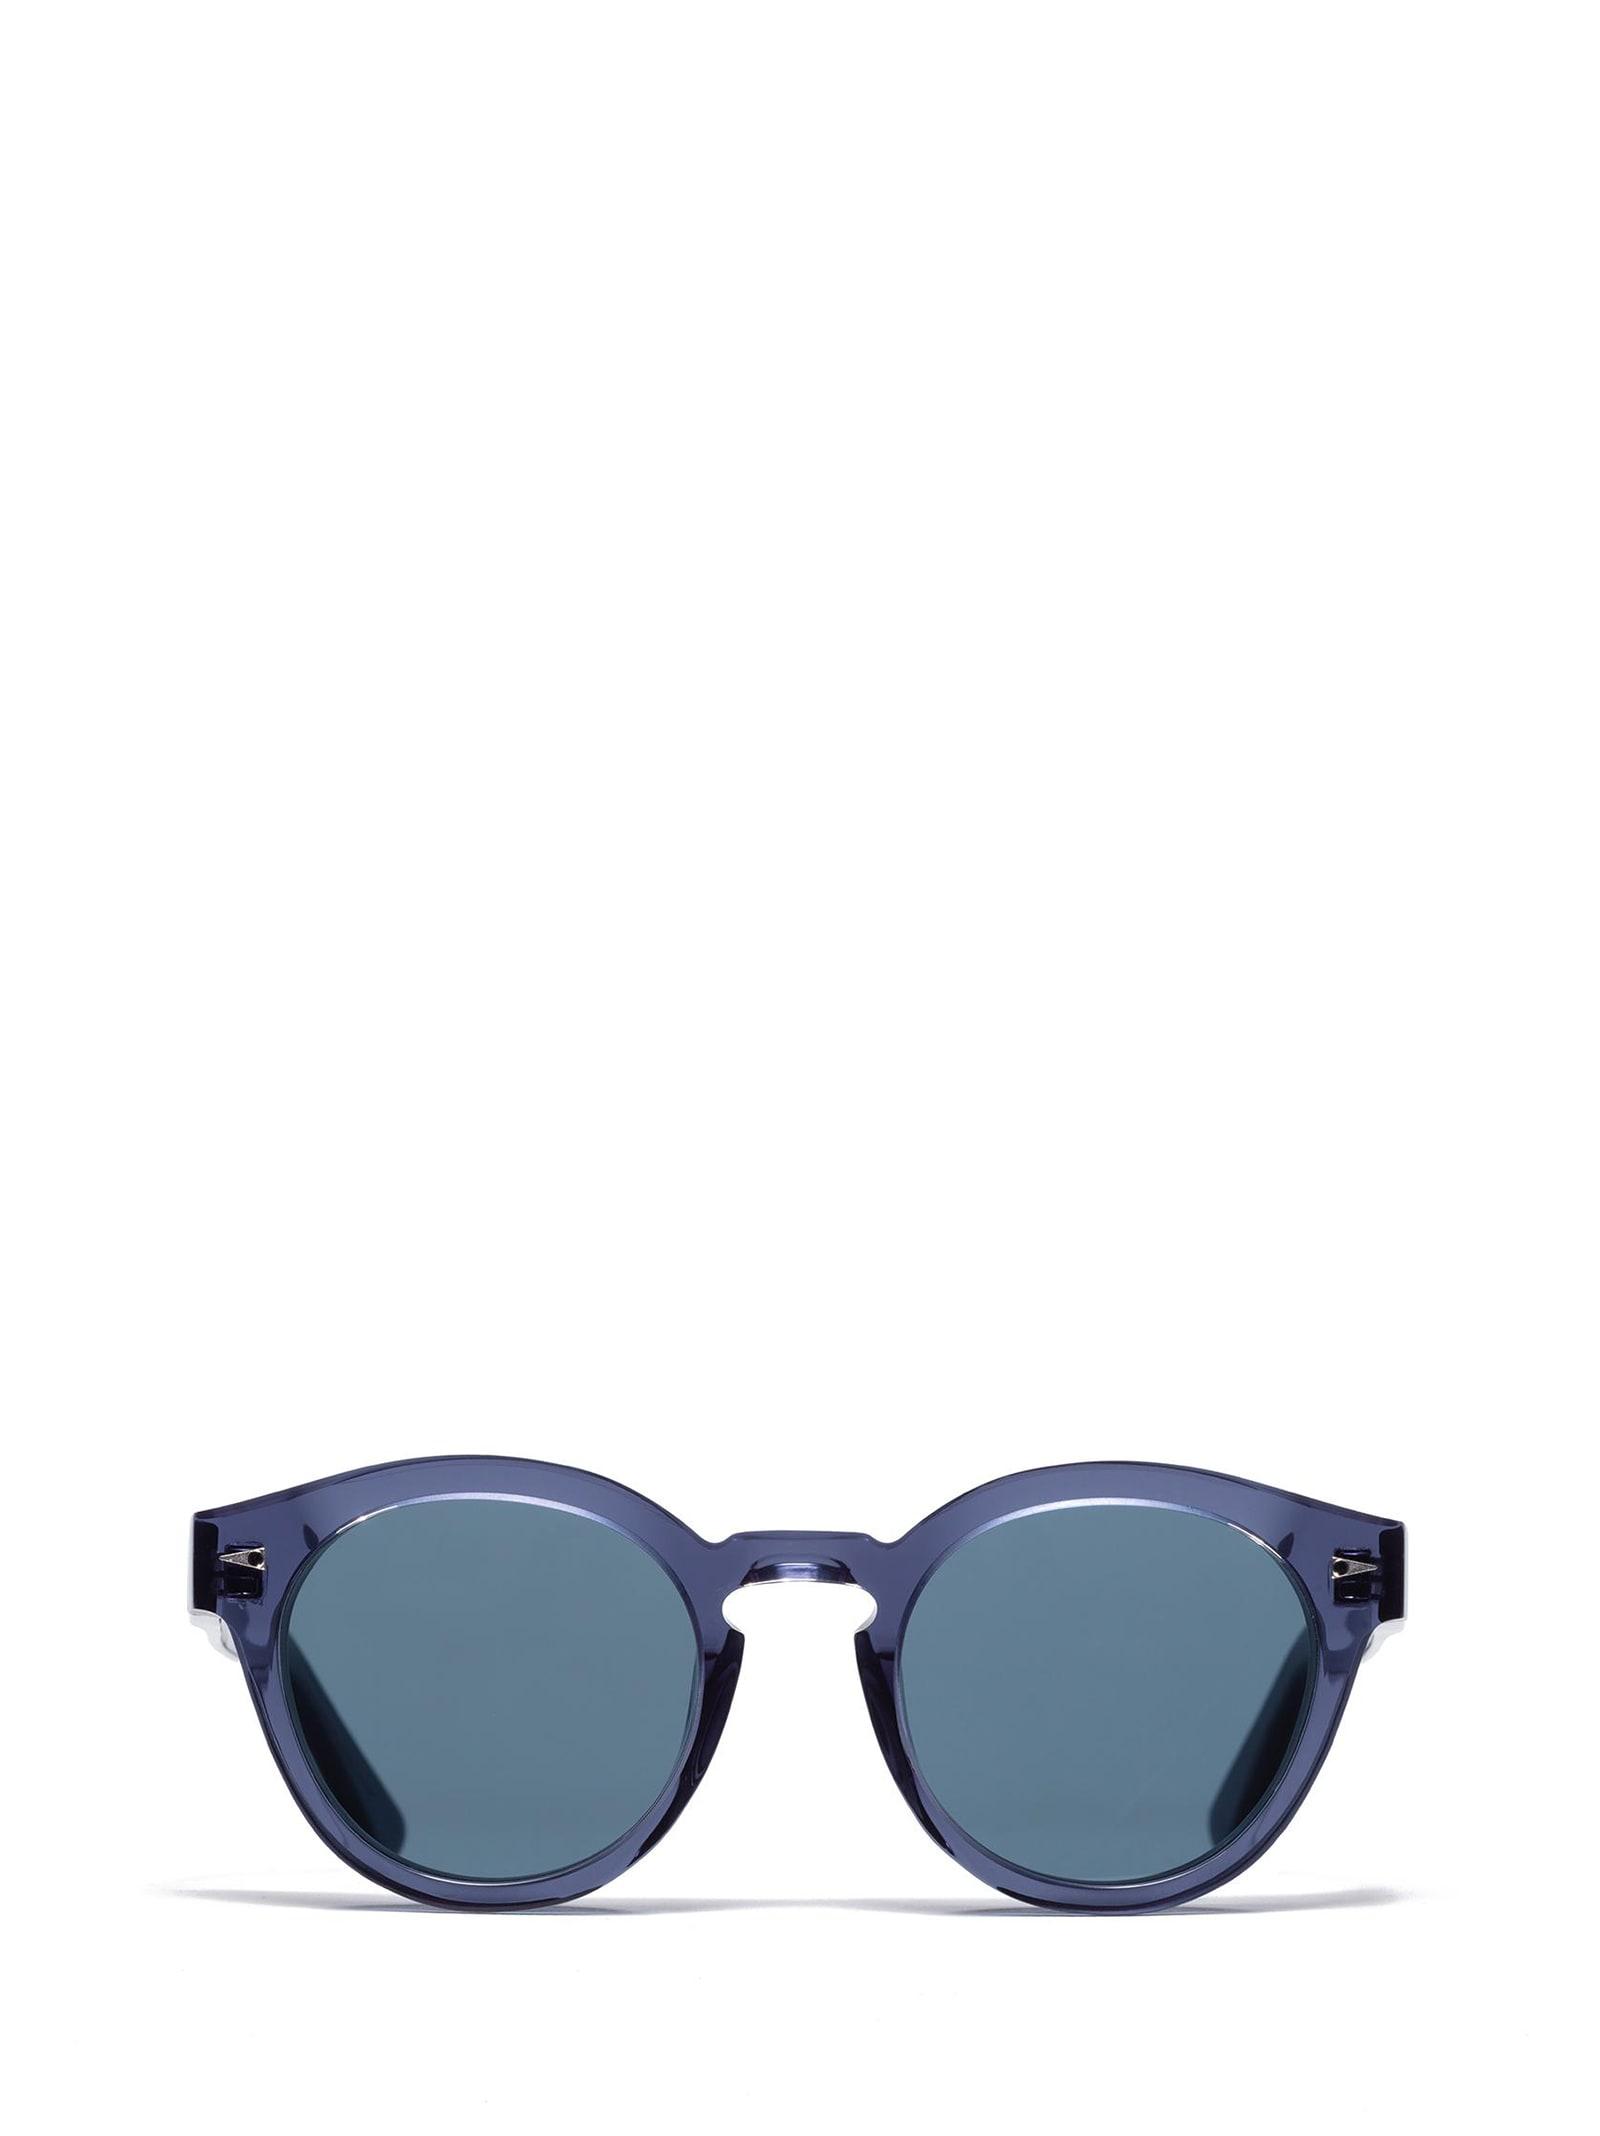 AHLEM Ahlem Abbesses Indigolight Sunglasses